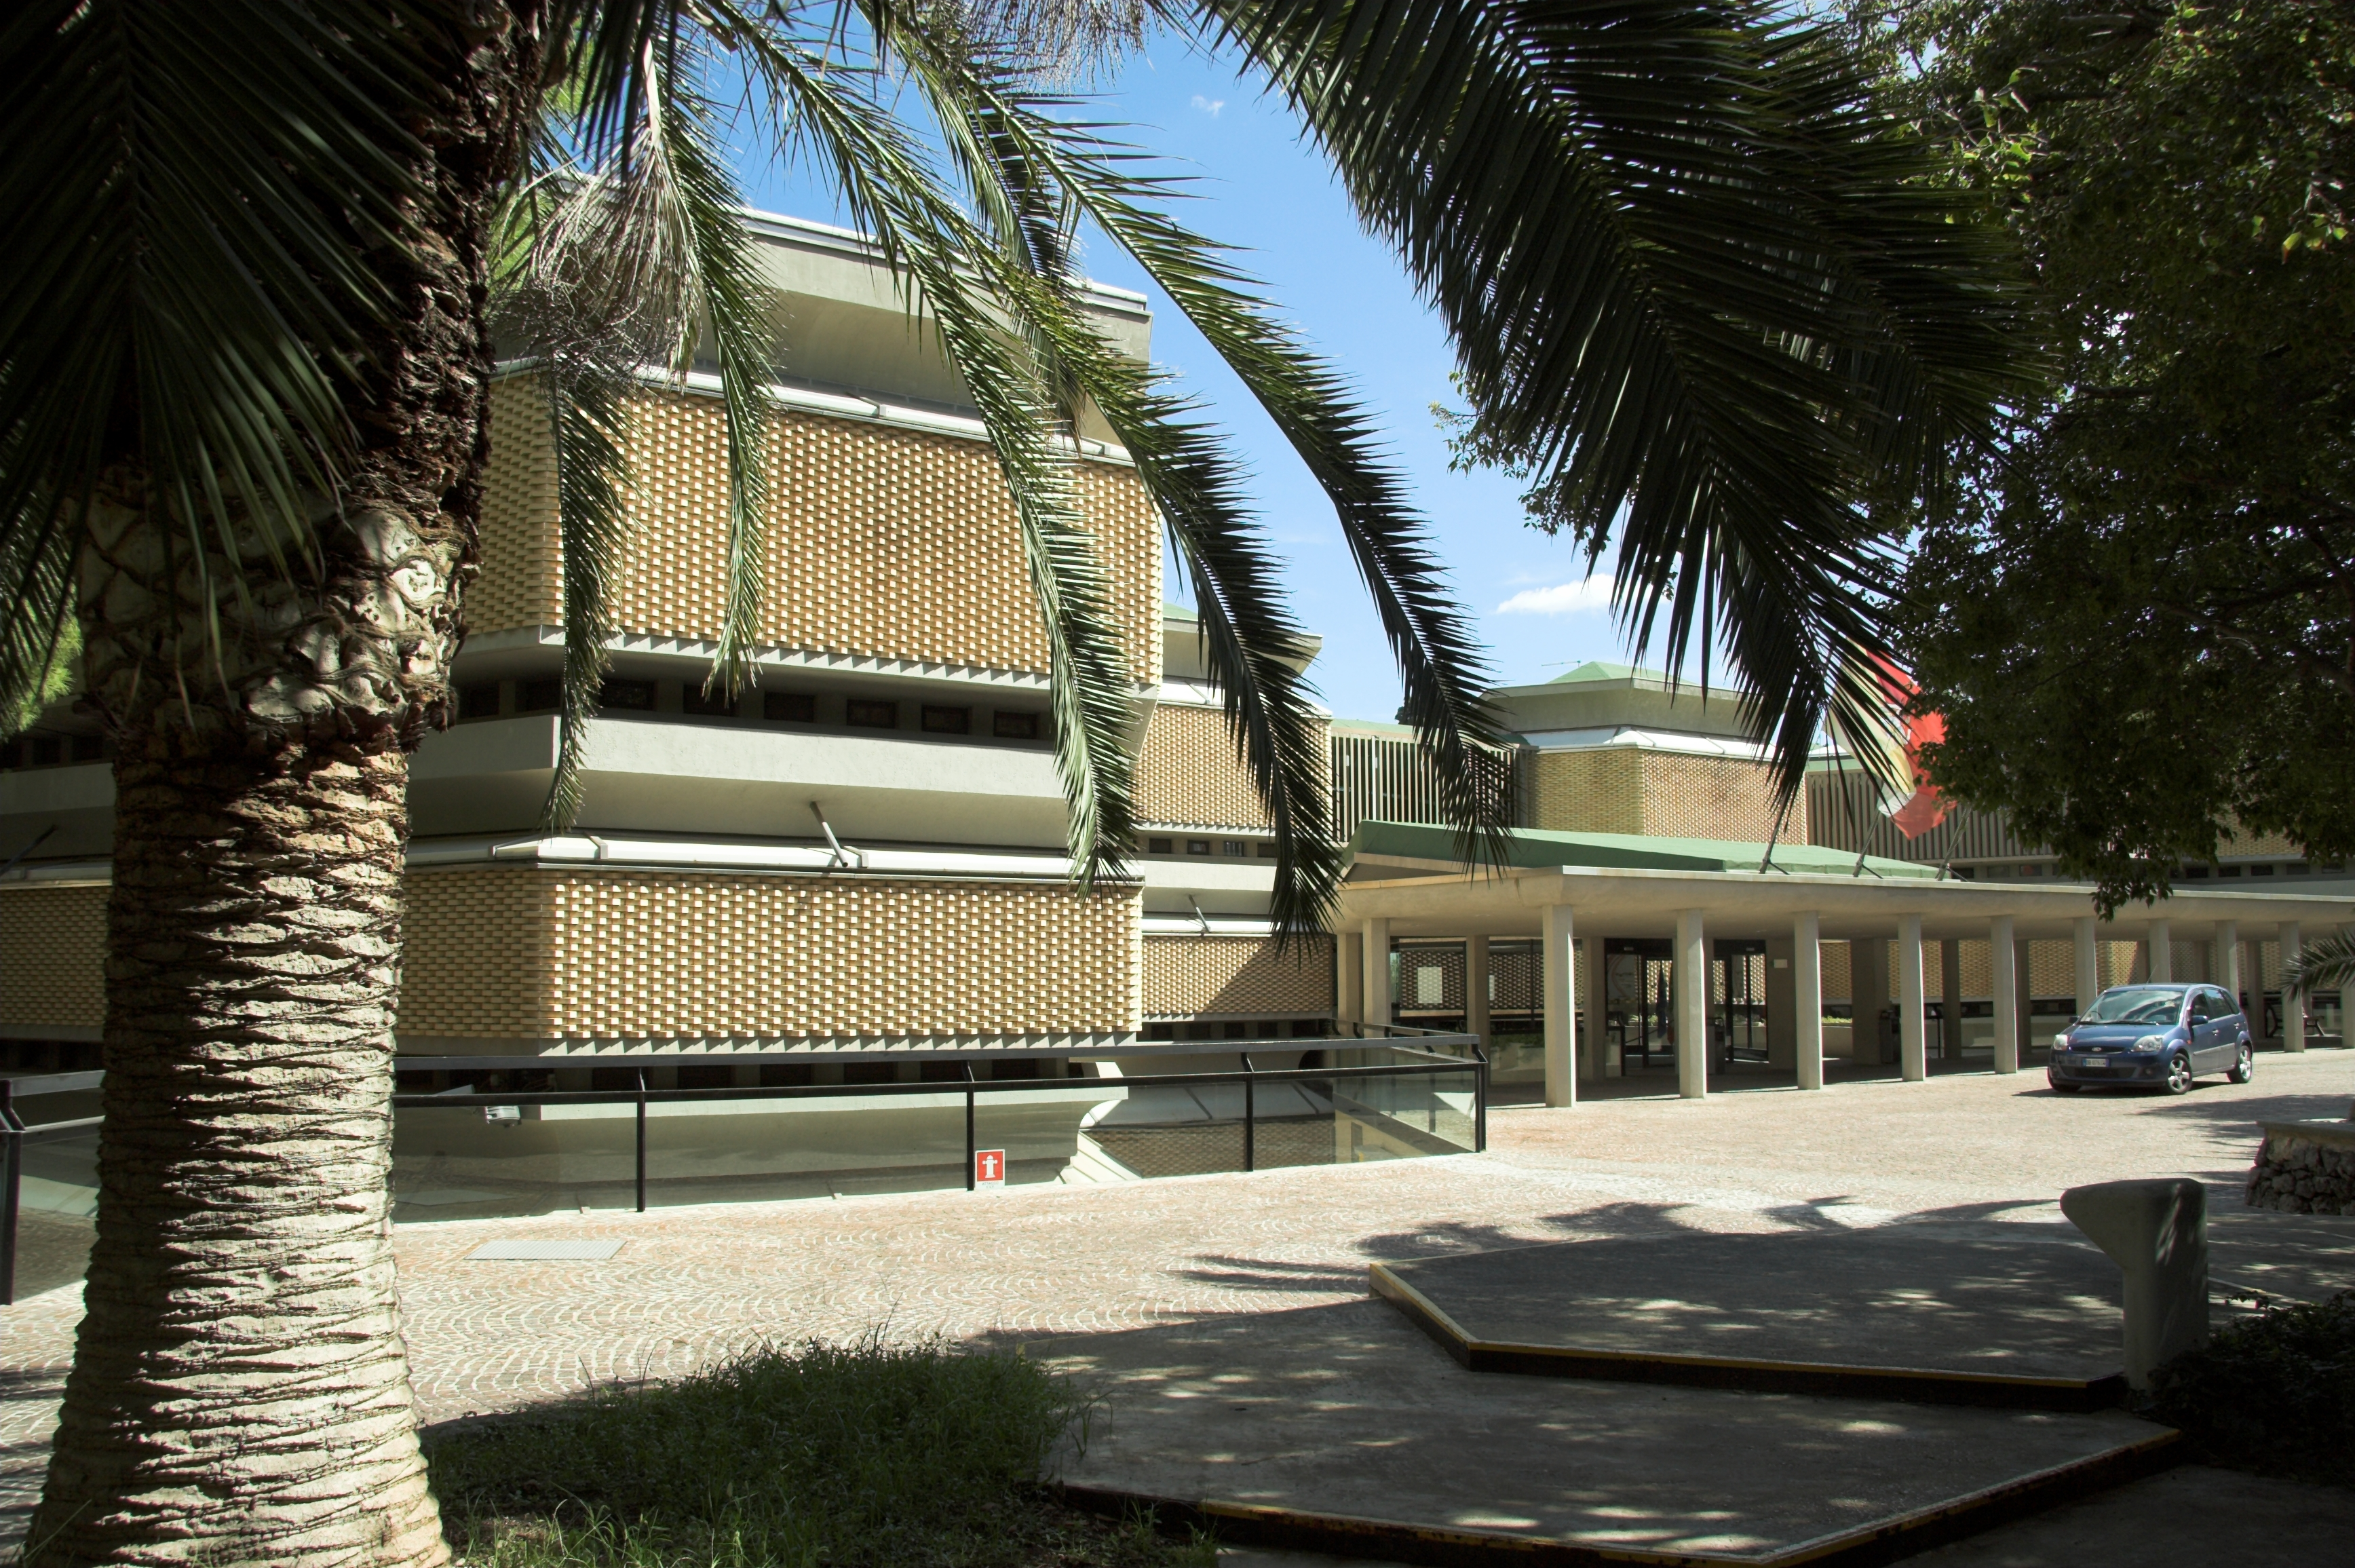 Building of Archeological Museum Syrakuse